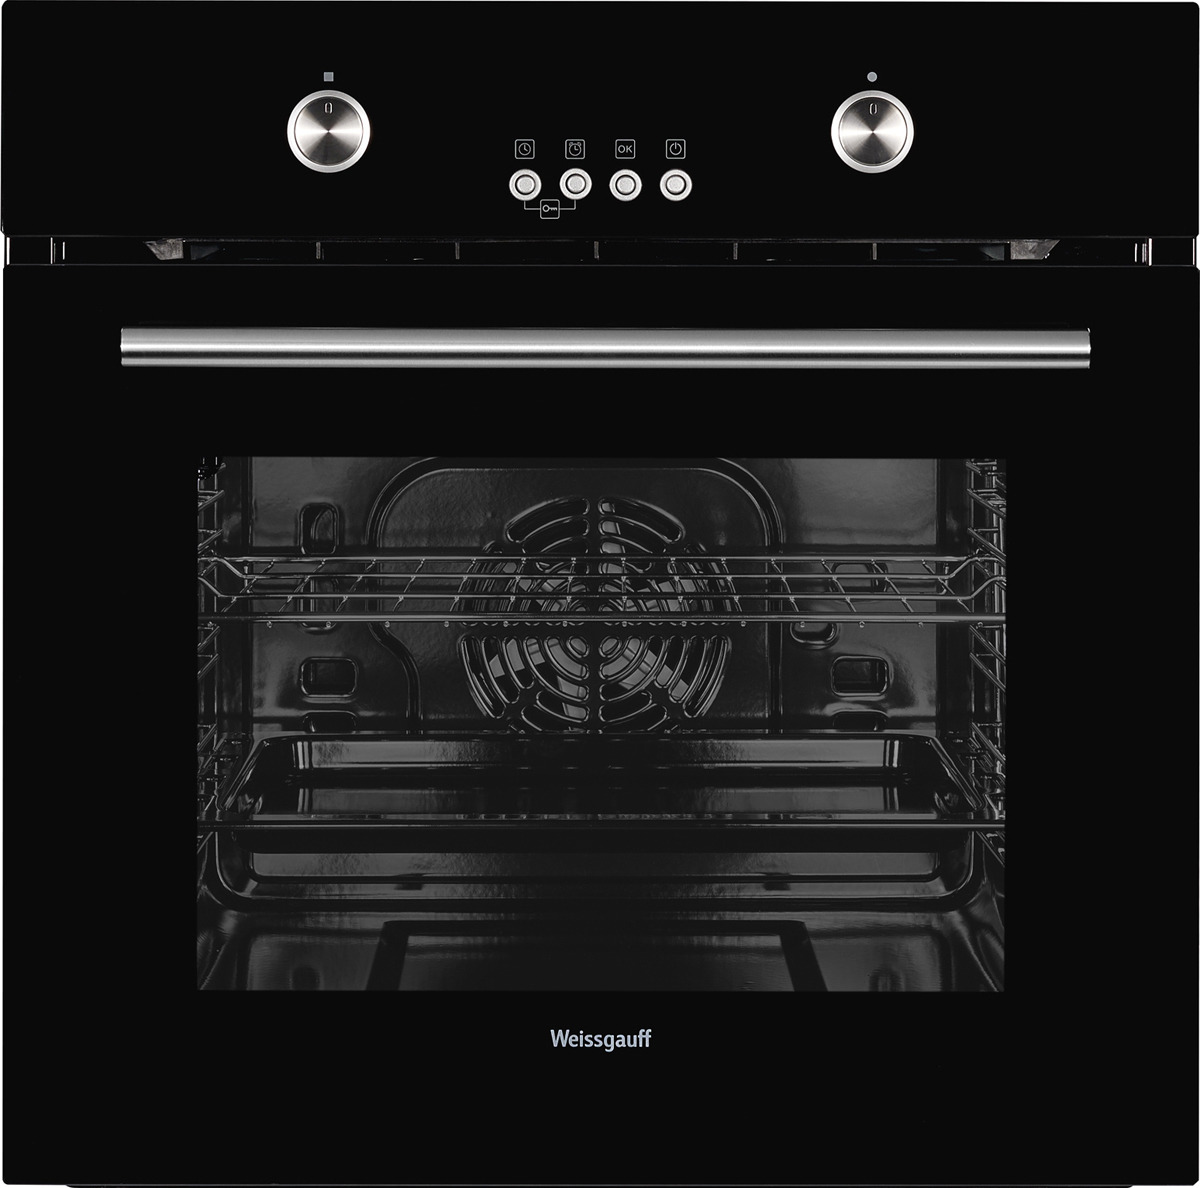 Духовой шкаф Weissgauff EOV 28 PDB, черный weissgauff eom 28 pdx